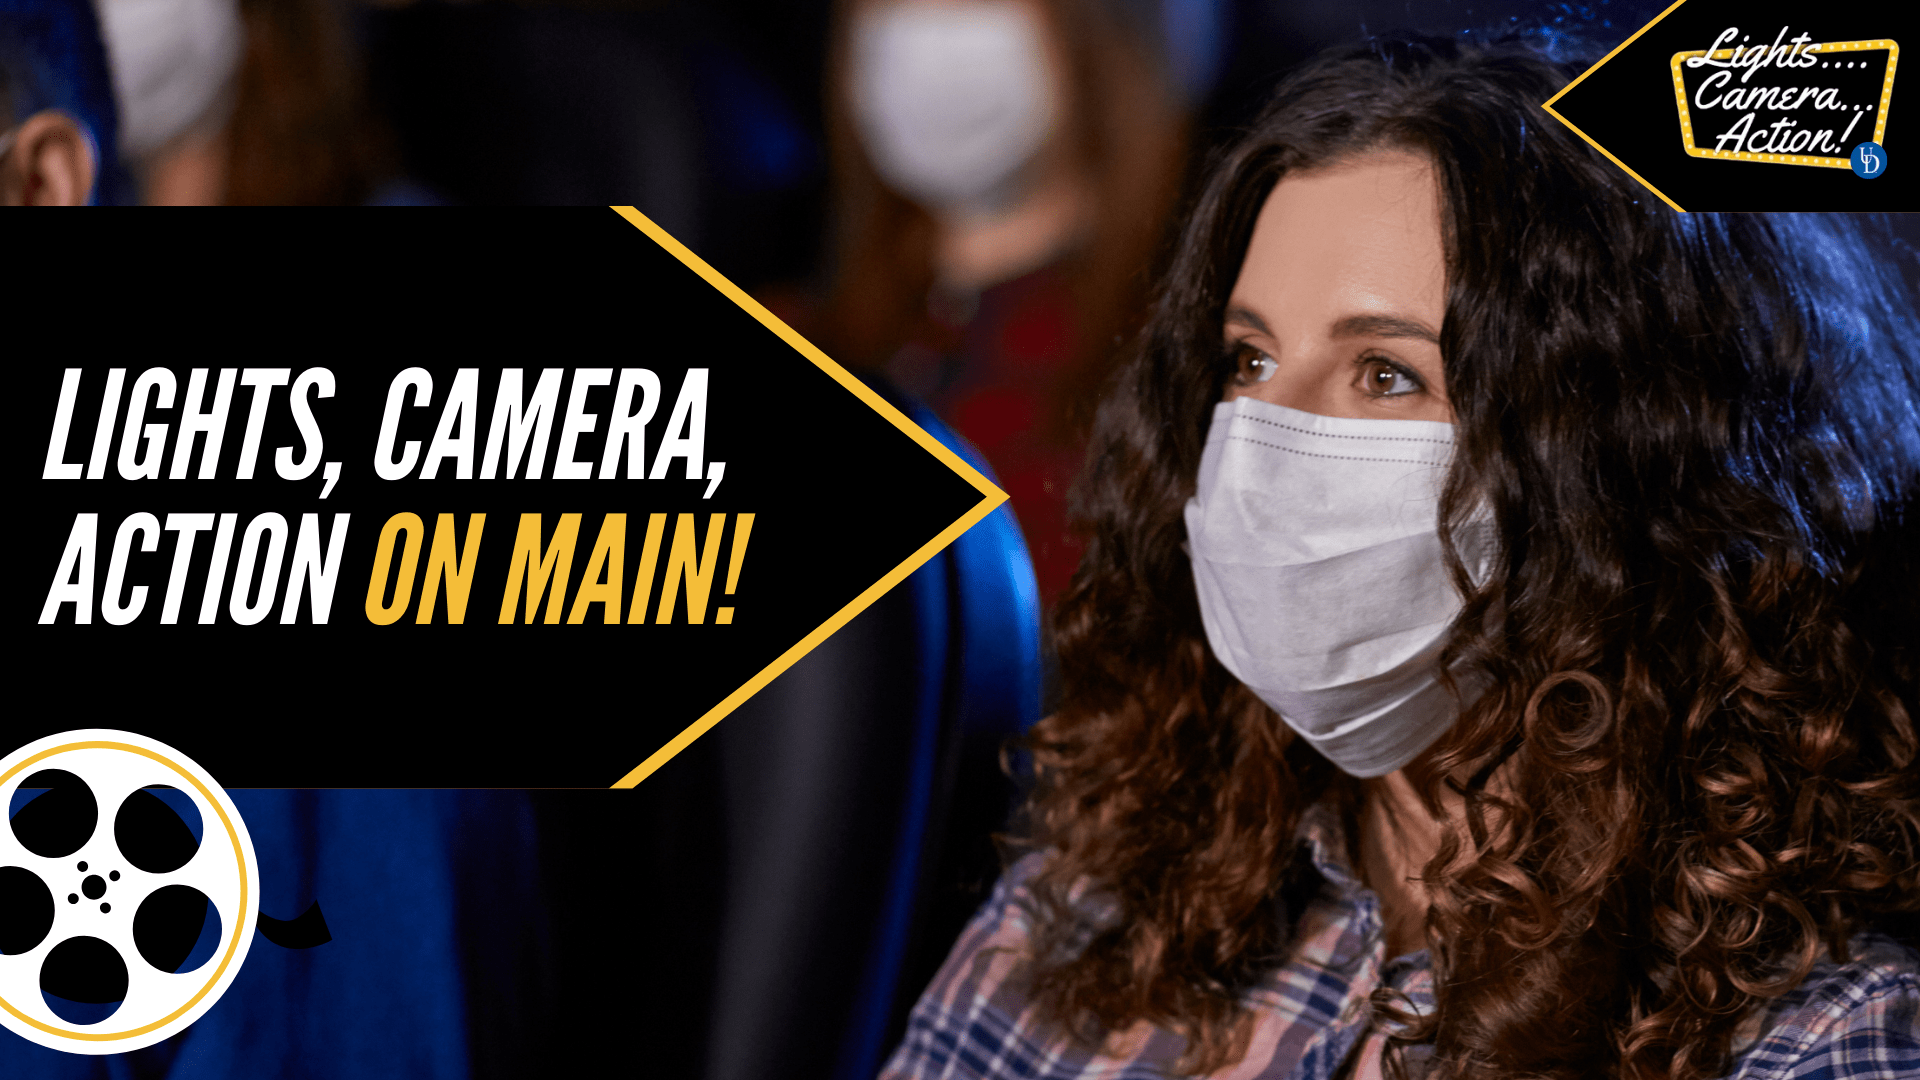 Lights, Camera, Action on Main!